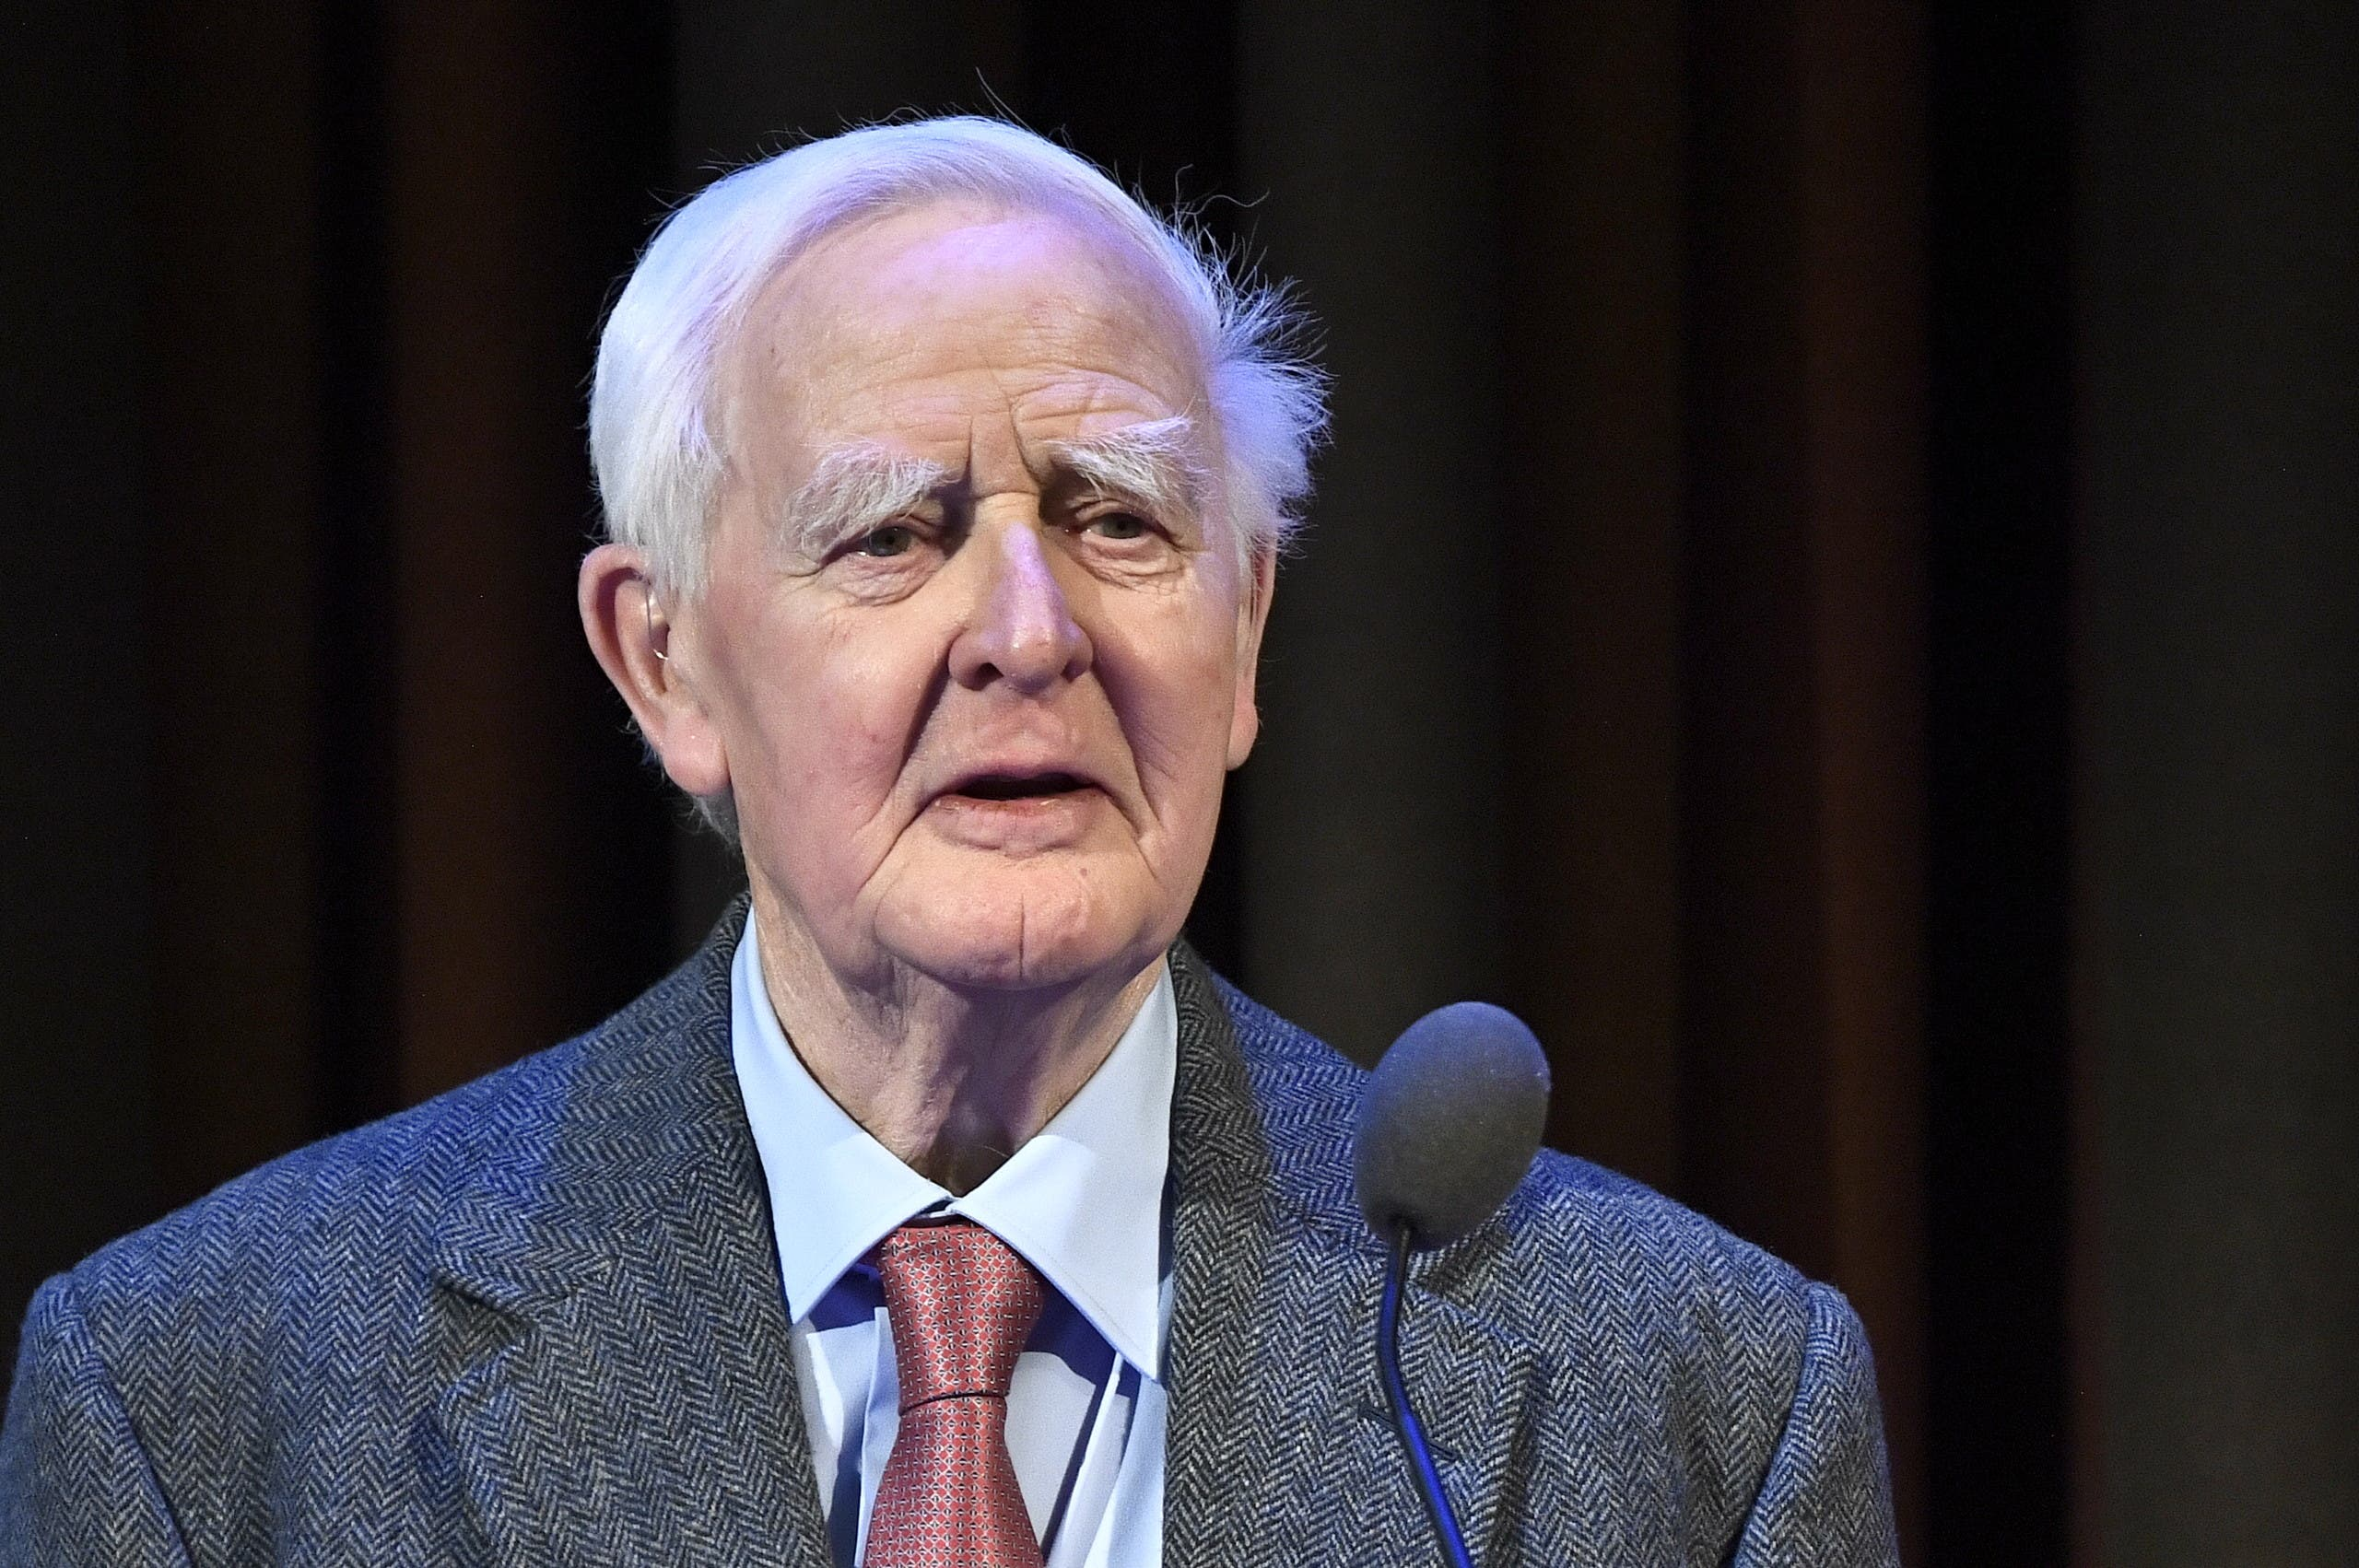 British author John le Carre (David John Moore Cornwell) speaks at the ceremony where he is awarded the Olof Palme Award 2019, January 30, 2020. (AFP)